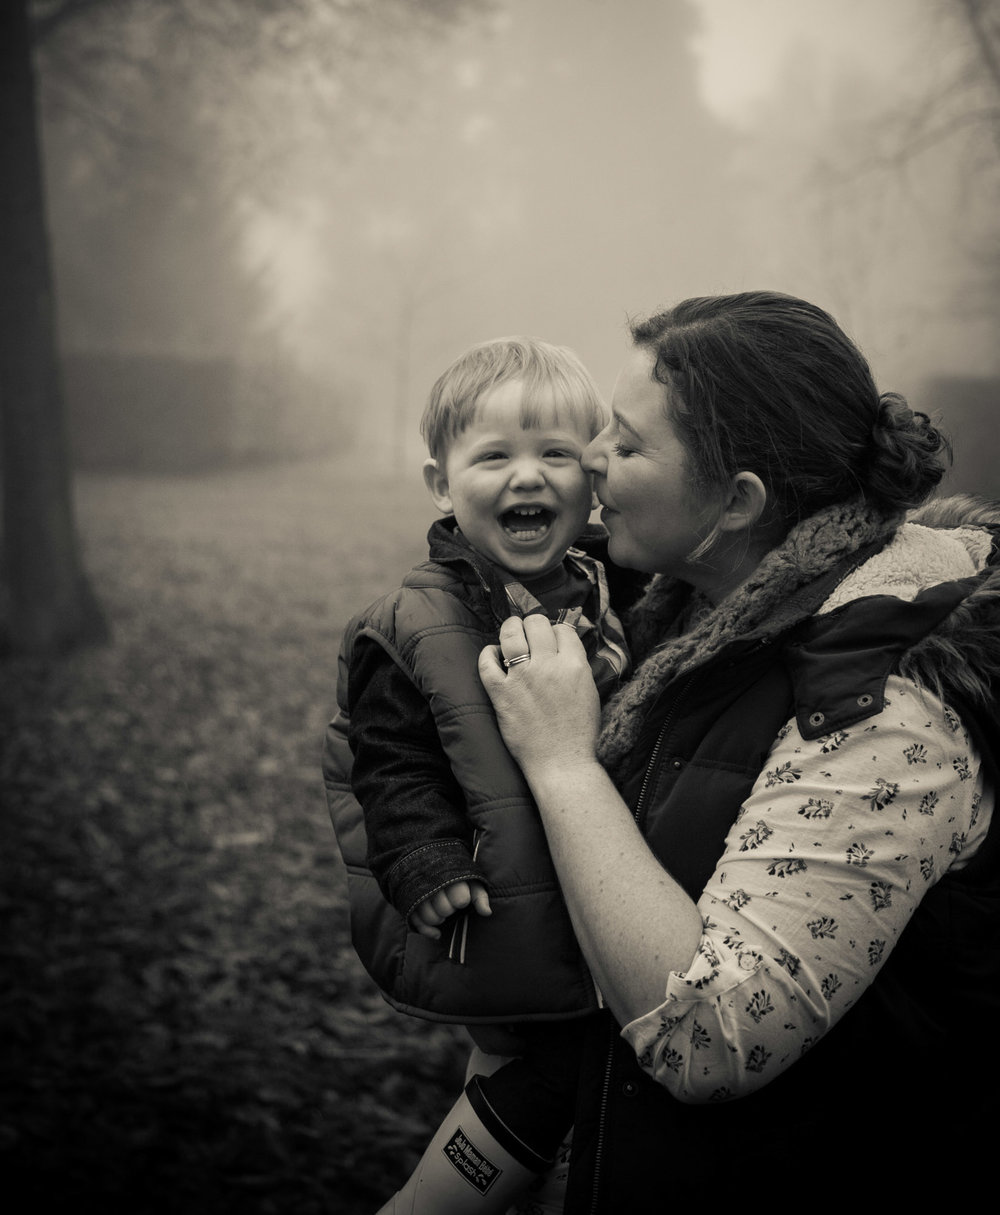 family-life-family-photographer-oxford-london-jonathan-self-photography-20.jpg